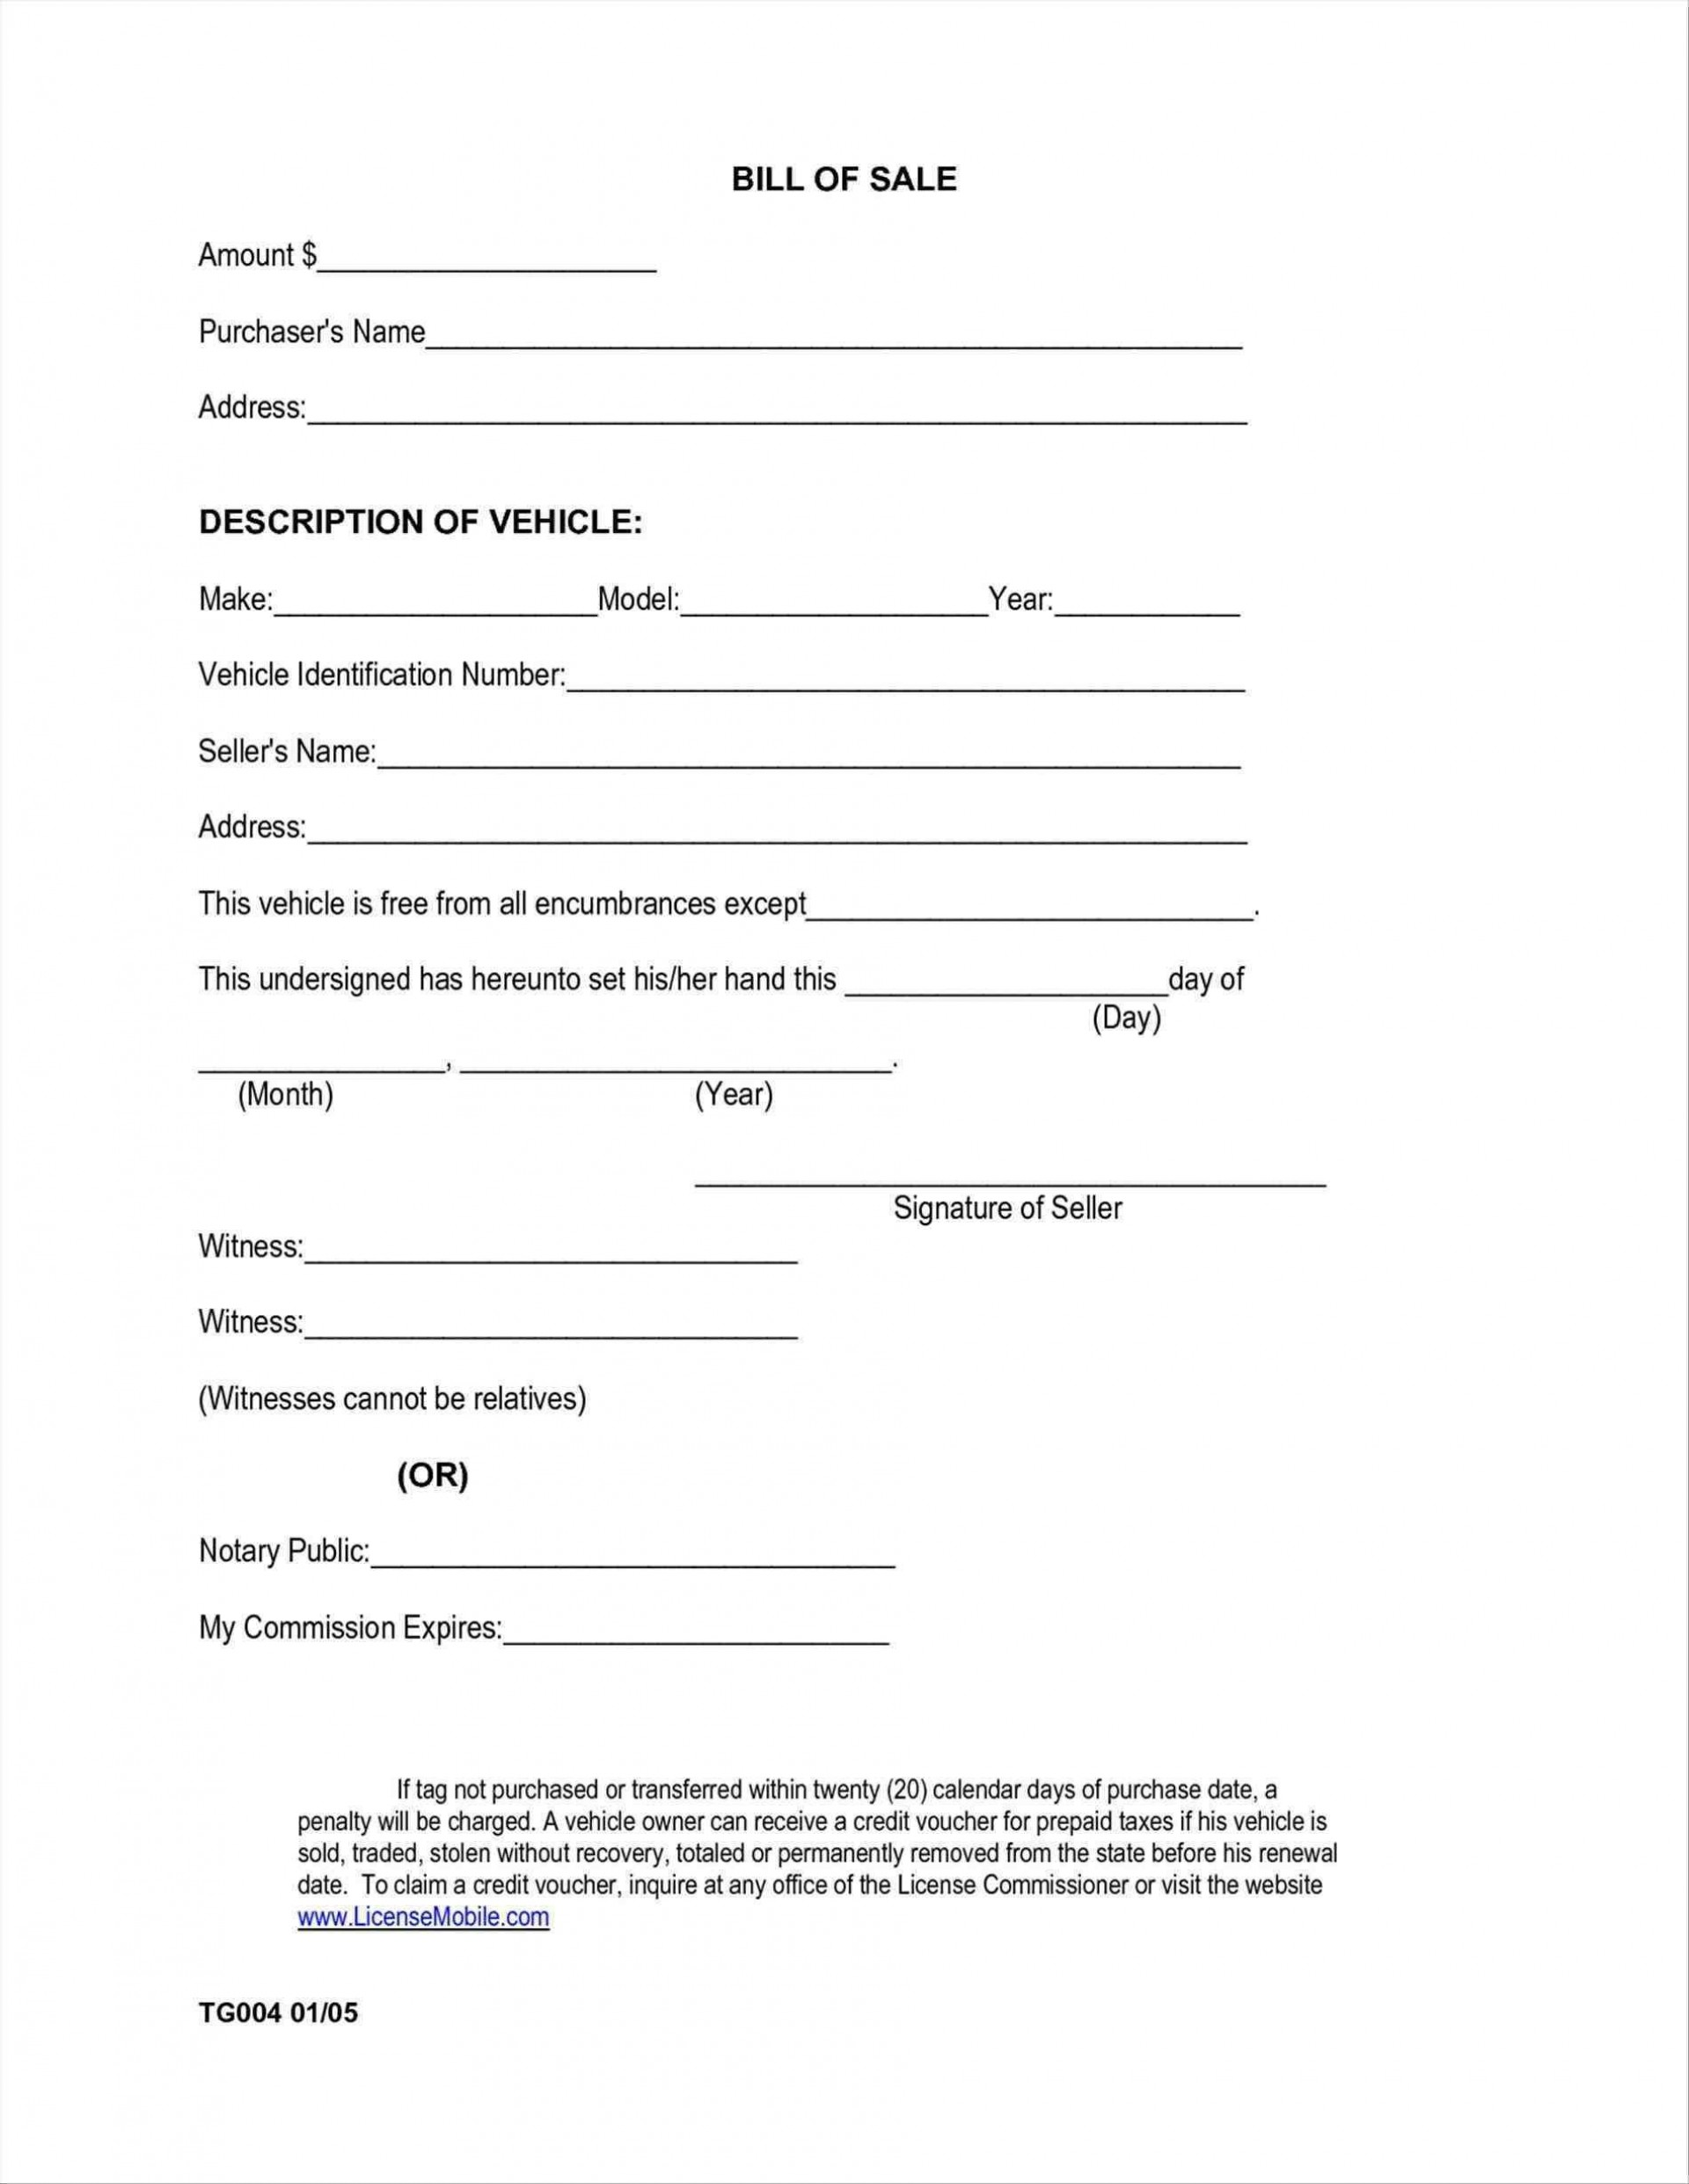 005 Exceptional Printable Bill Of Sale Template Idea  Word Saskatchewan Free Used Car Ontario1920